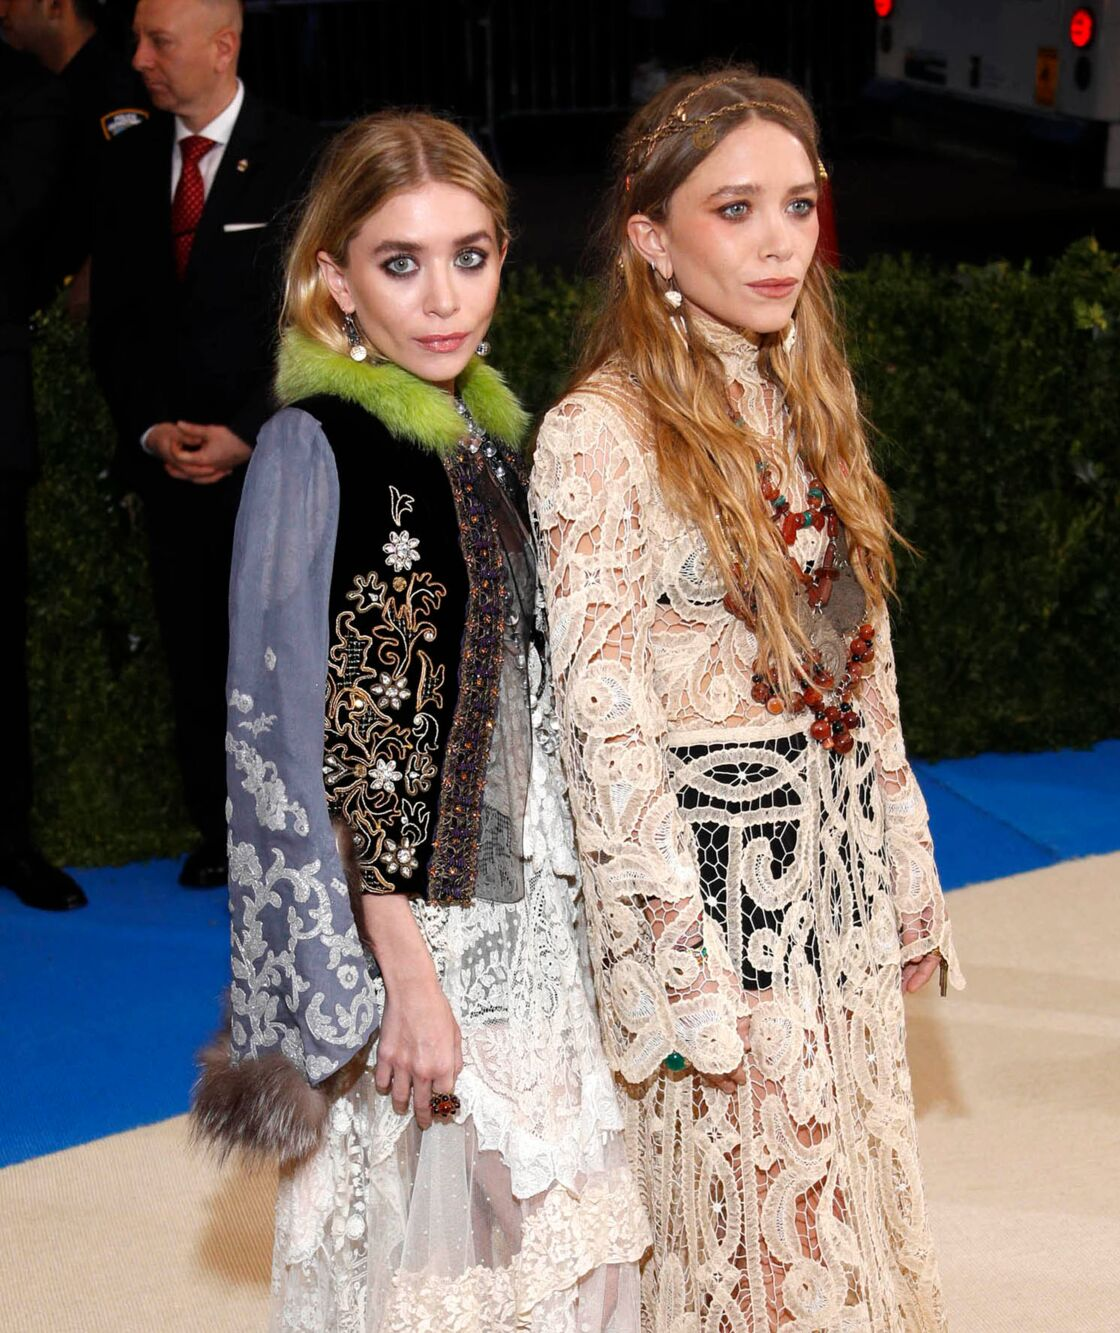 Mary-Kate et Ashley Oslen lors du gala du Met à New York le 1er mai 2017